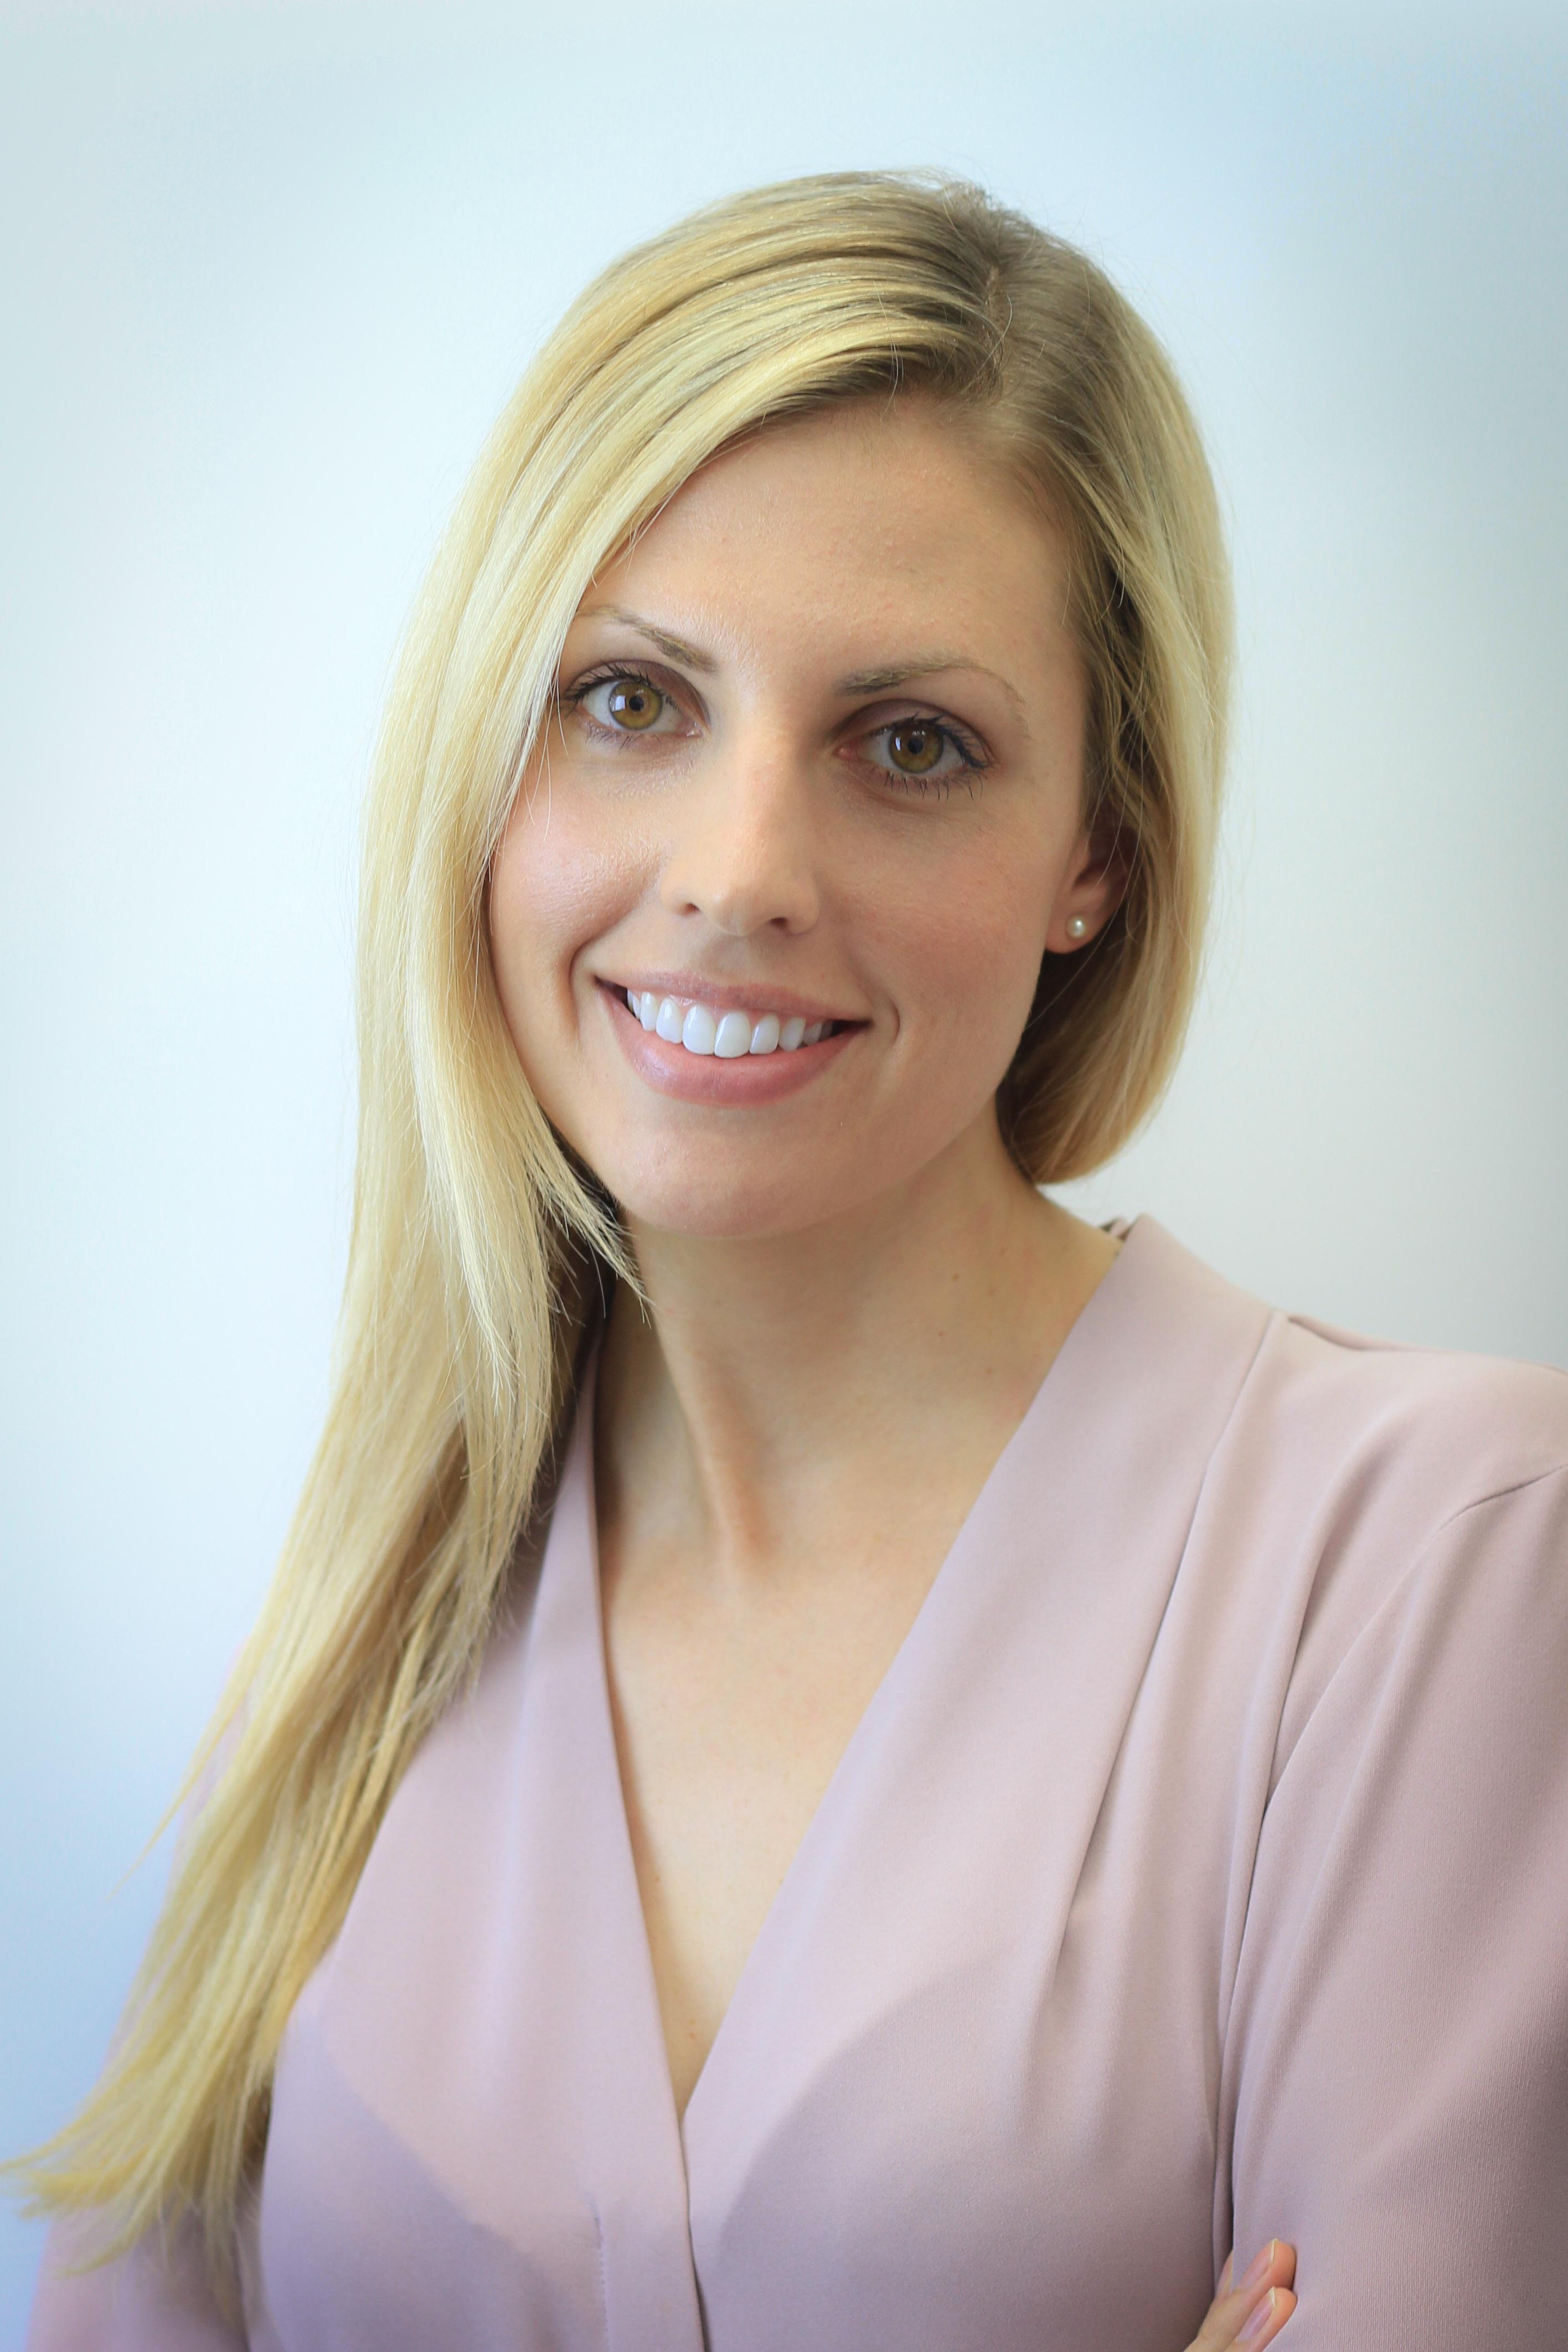 Dr. Angela Caron